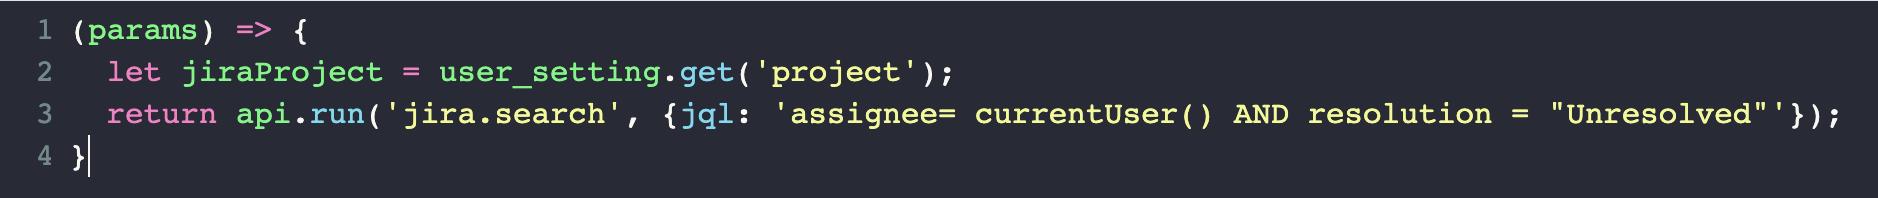 User configuration settings